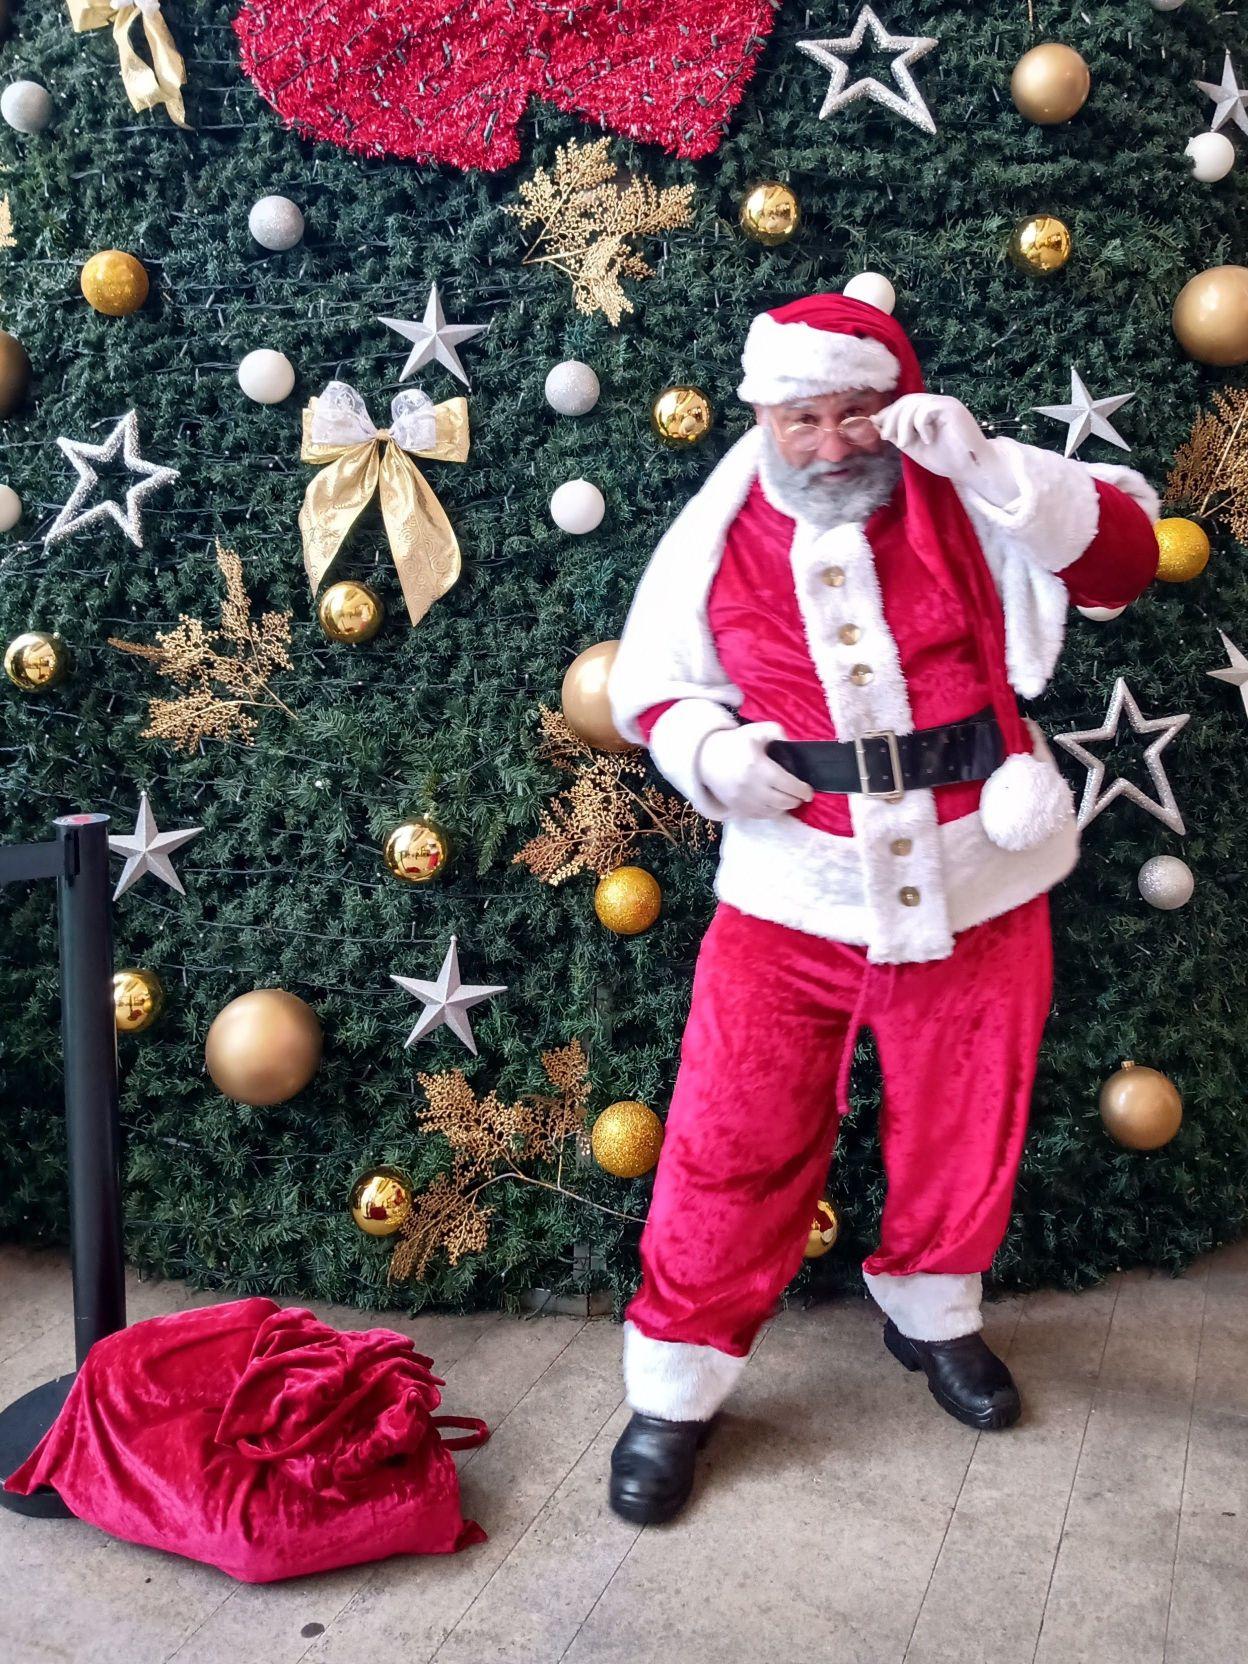 Papai Noel figurino.